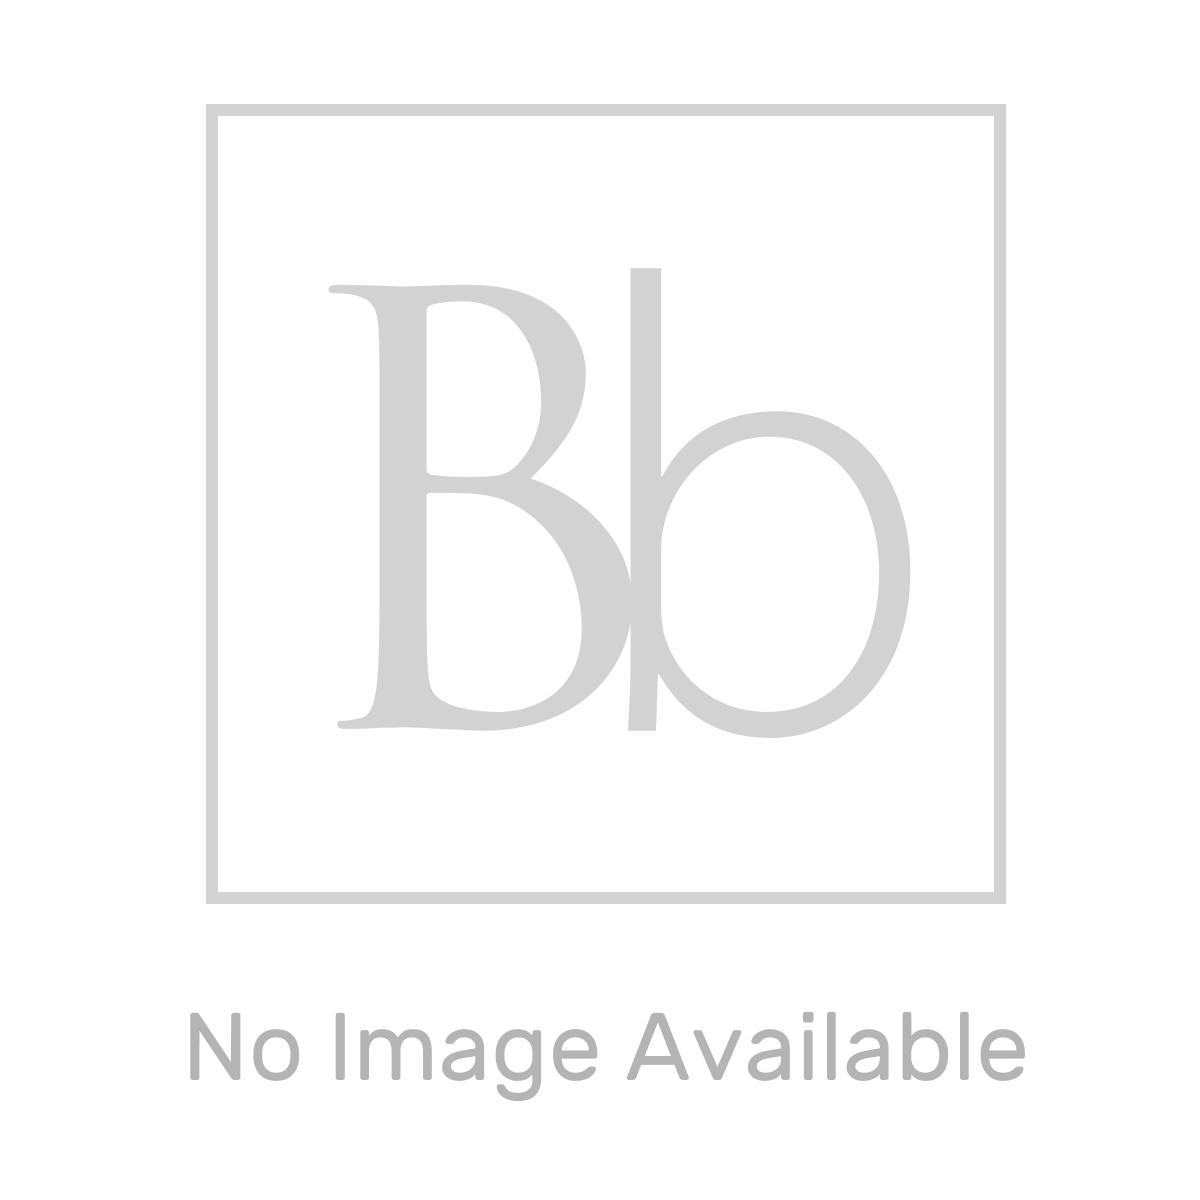 HiB Rondo Round Bathroom Mirror